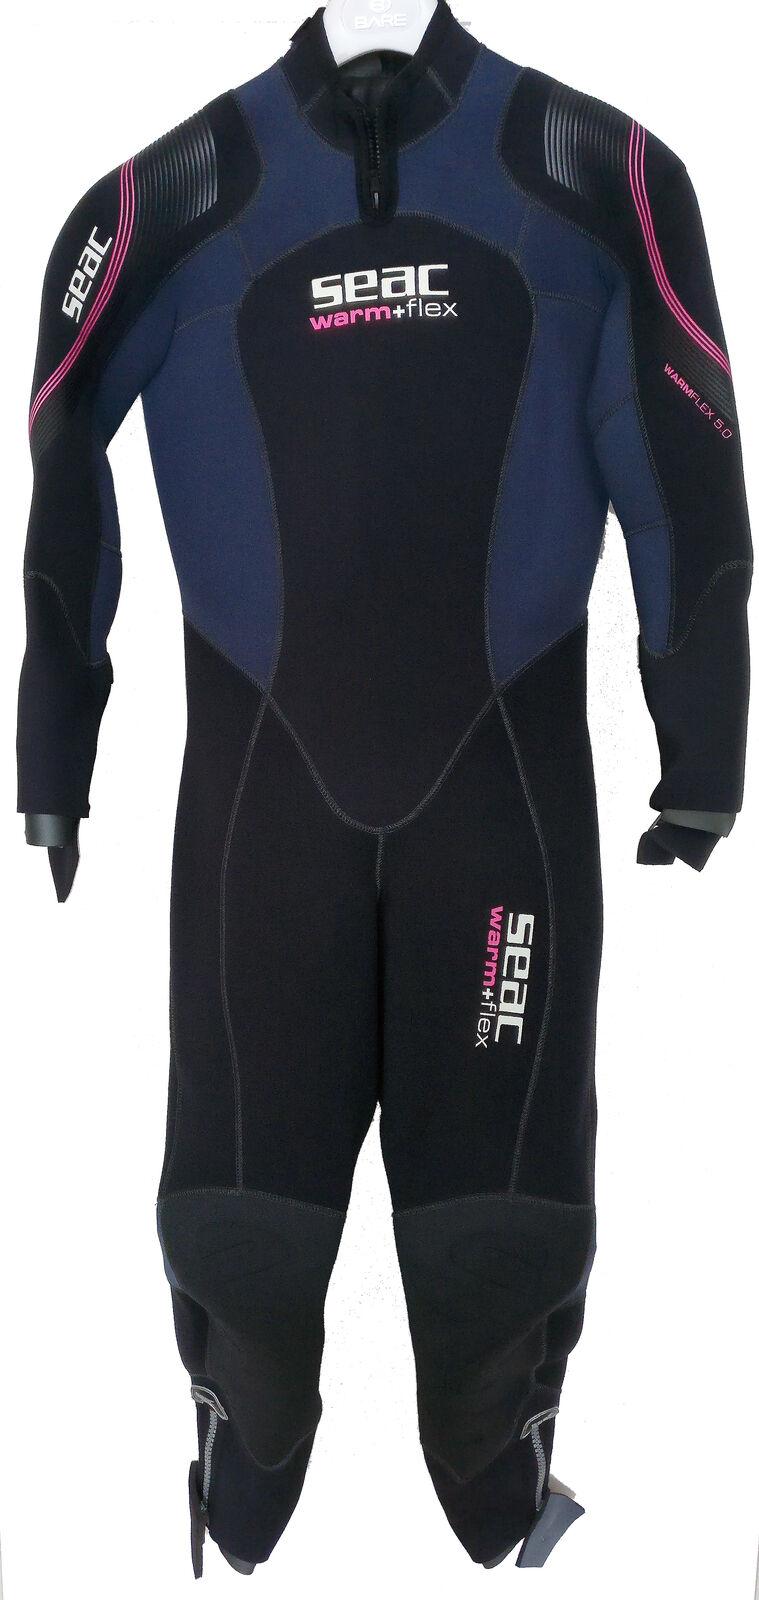 Speciale aanbieding --Seac Warm Flex Lady 5 mm Ladies Semi Drory Suit --Grootte XL